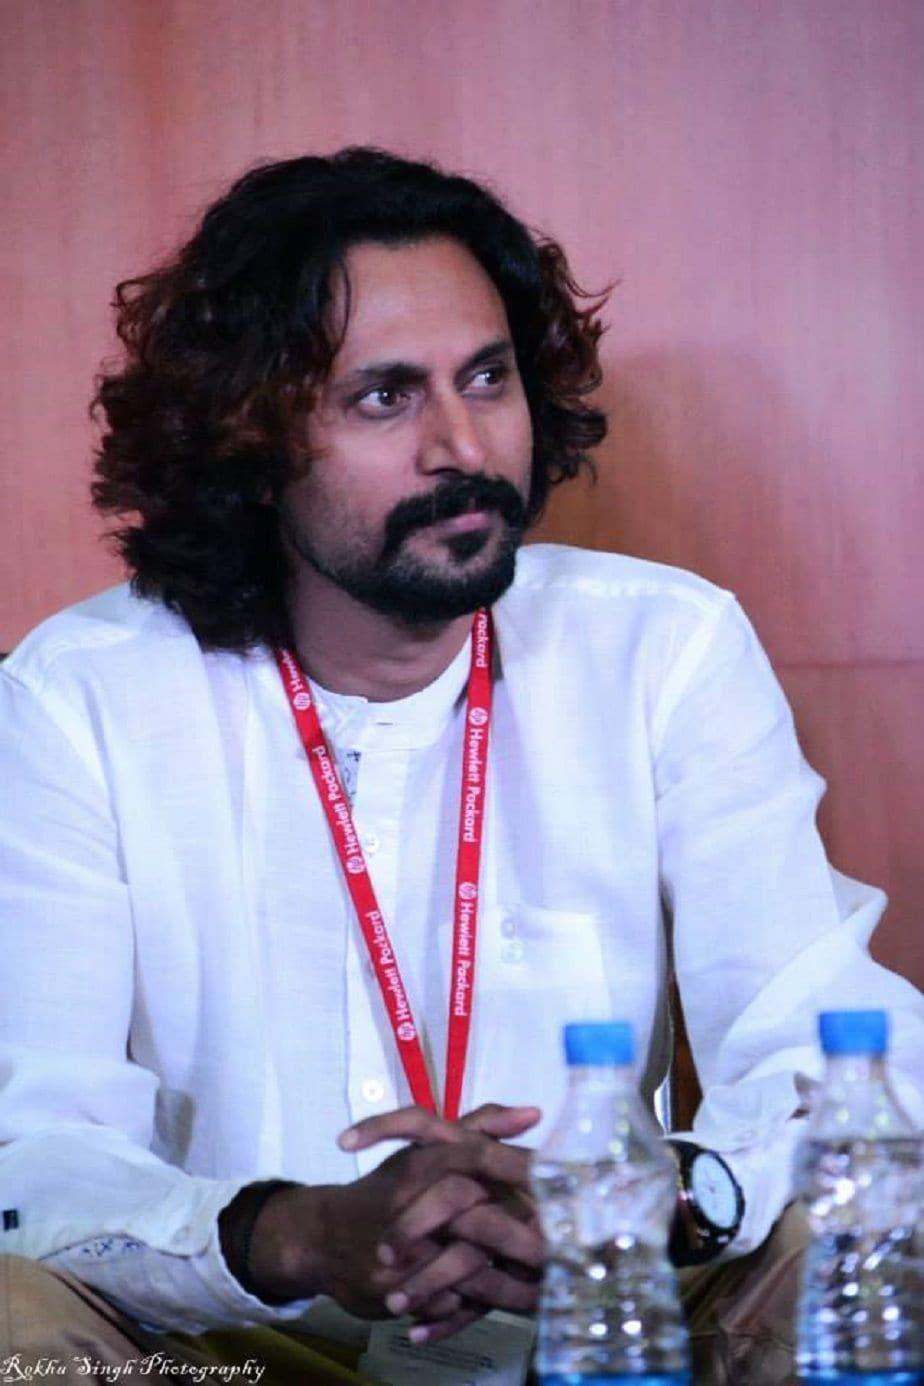 Bigg boss season 1: ಇನ್ನು ಅರುಣ್ ಸಾಗರ್ ರನ್ನರ್ ಅಪ್ ಆಗಿ ಹೊರಹೊಮ್ಮಿದರು.